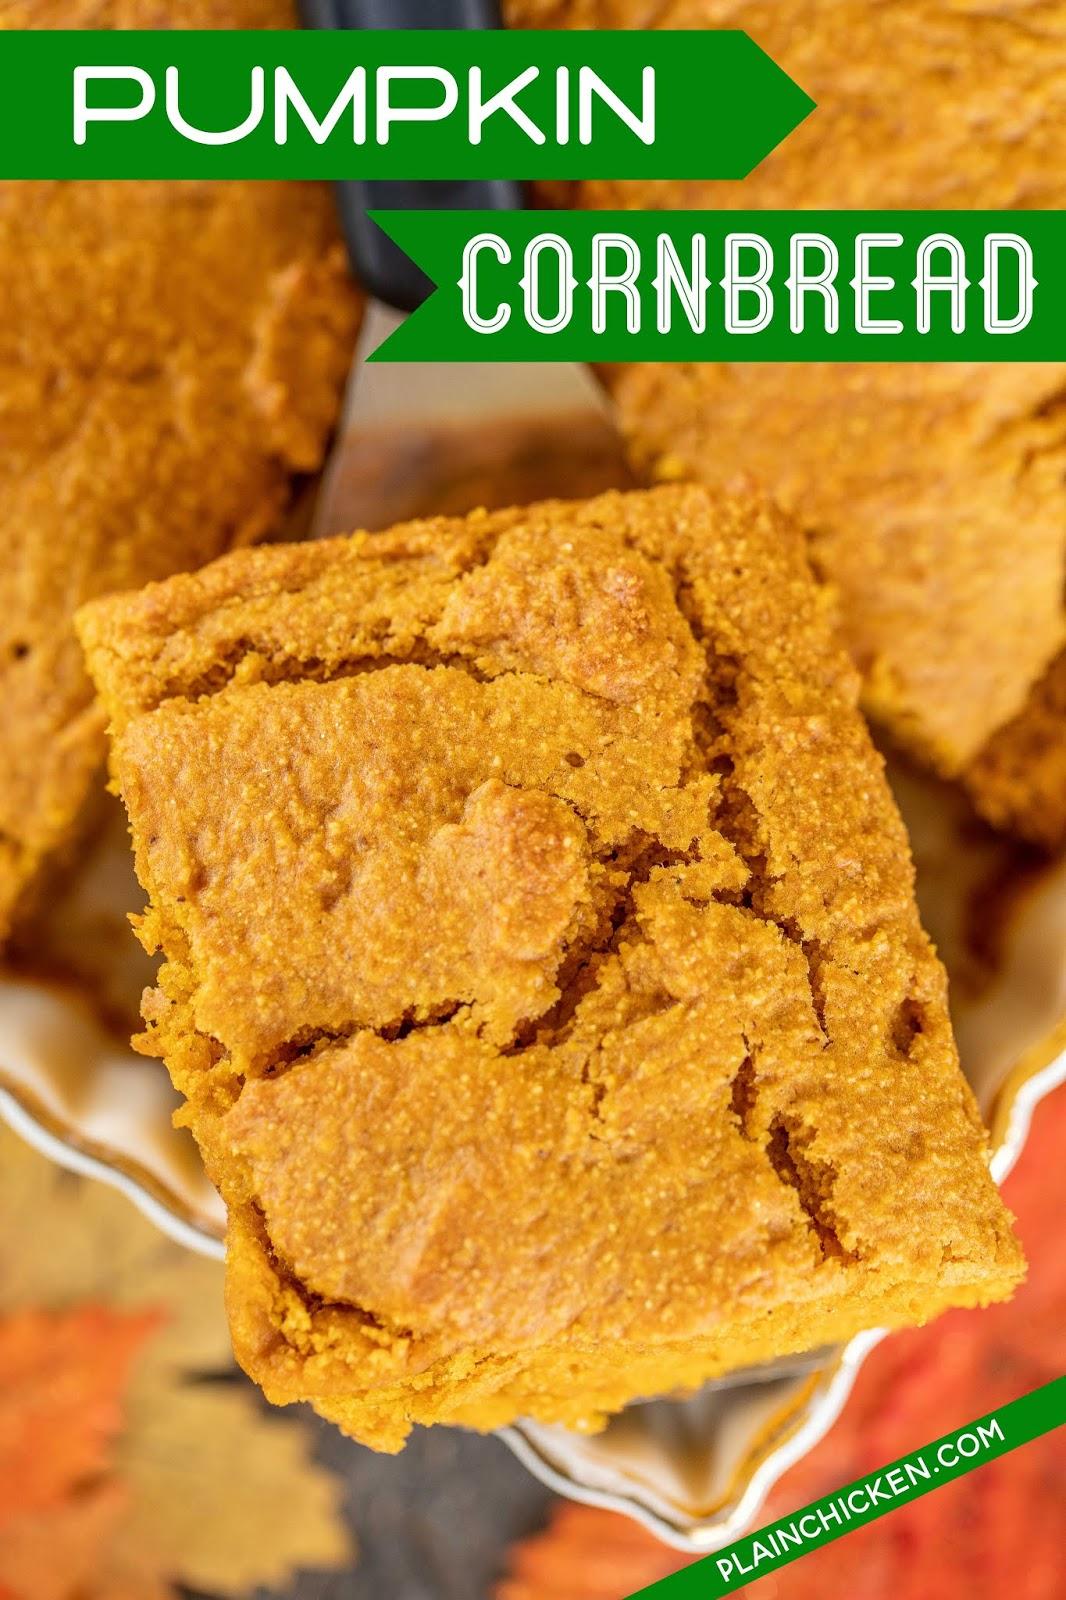 slice of pumpkin cornbread